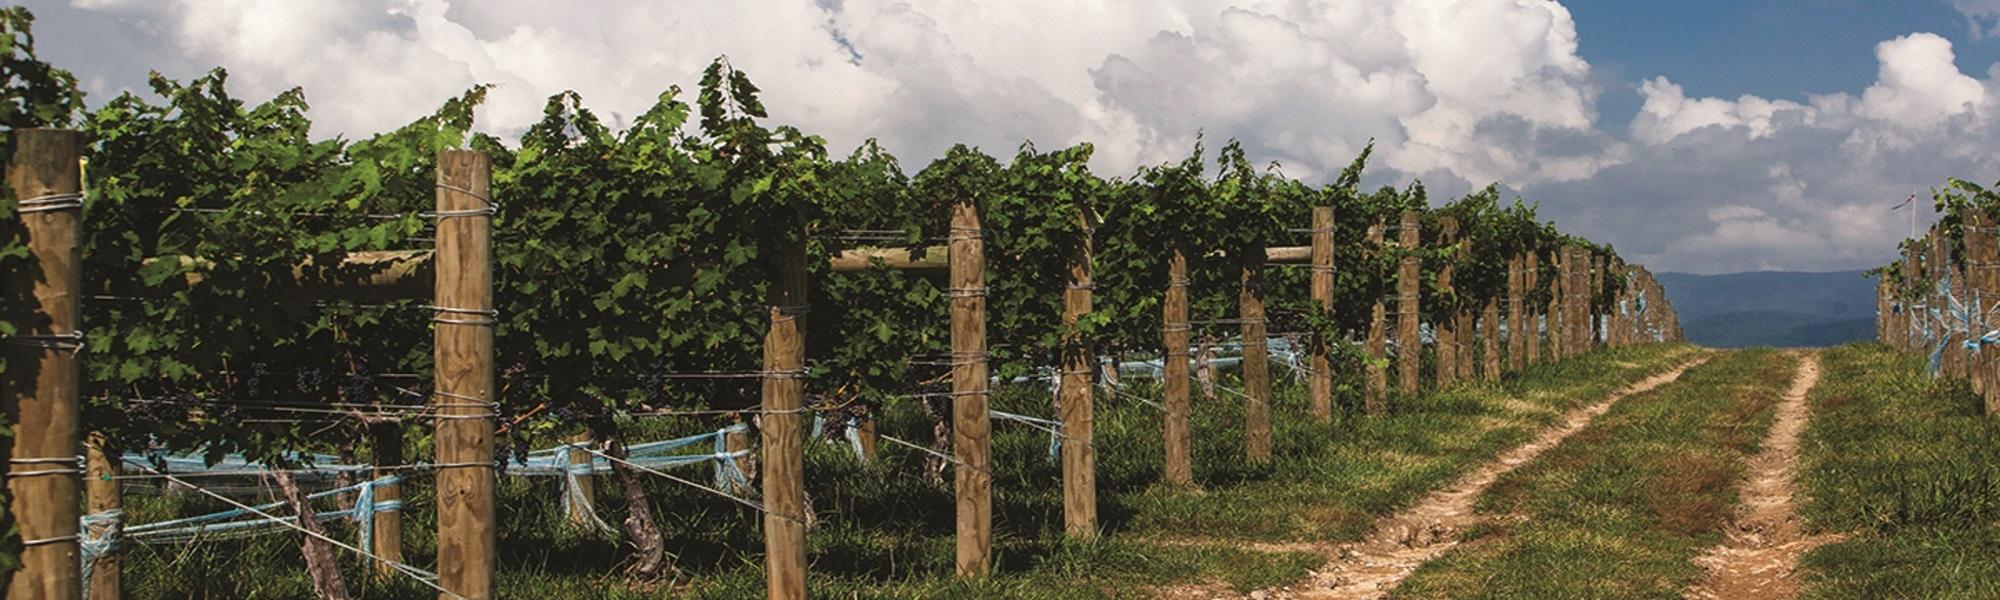 Shenendoah Valley Winery - Vinyard